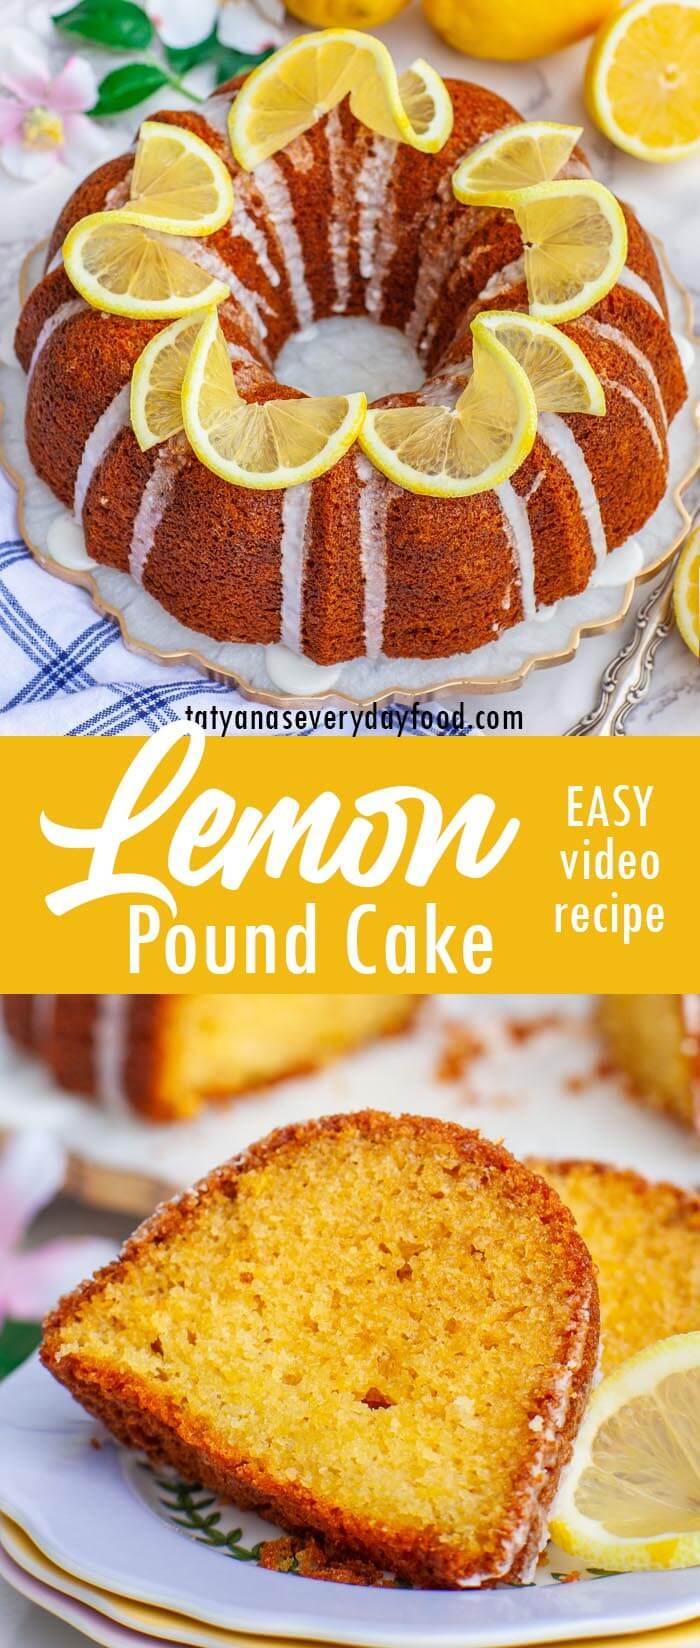 Easy Lemon Pound Cake video recipe